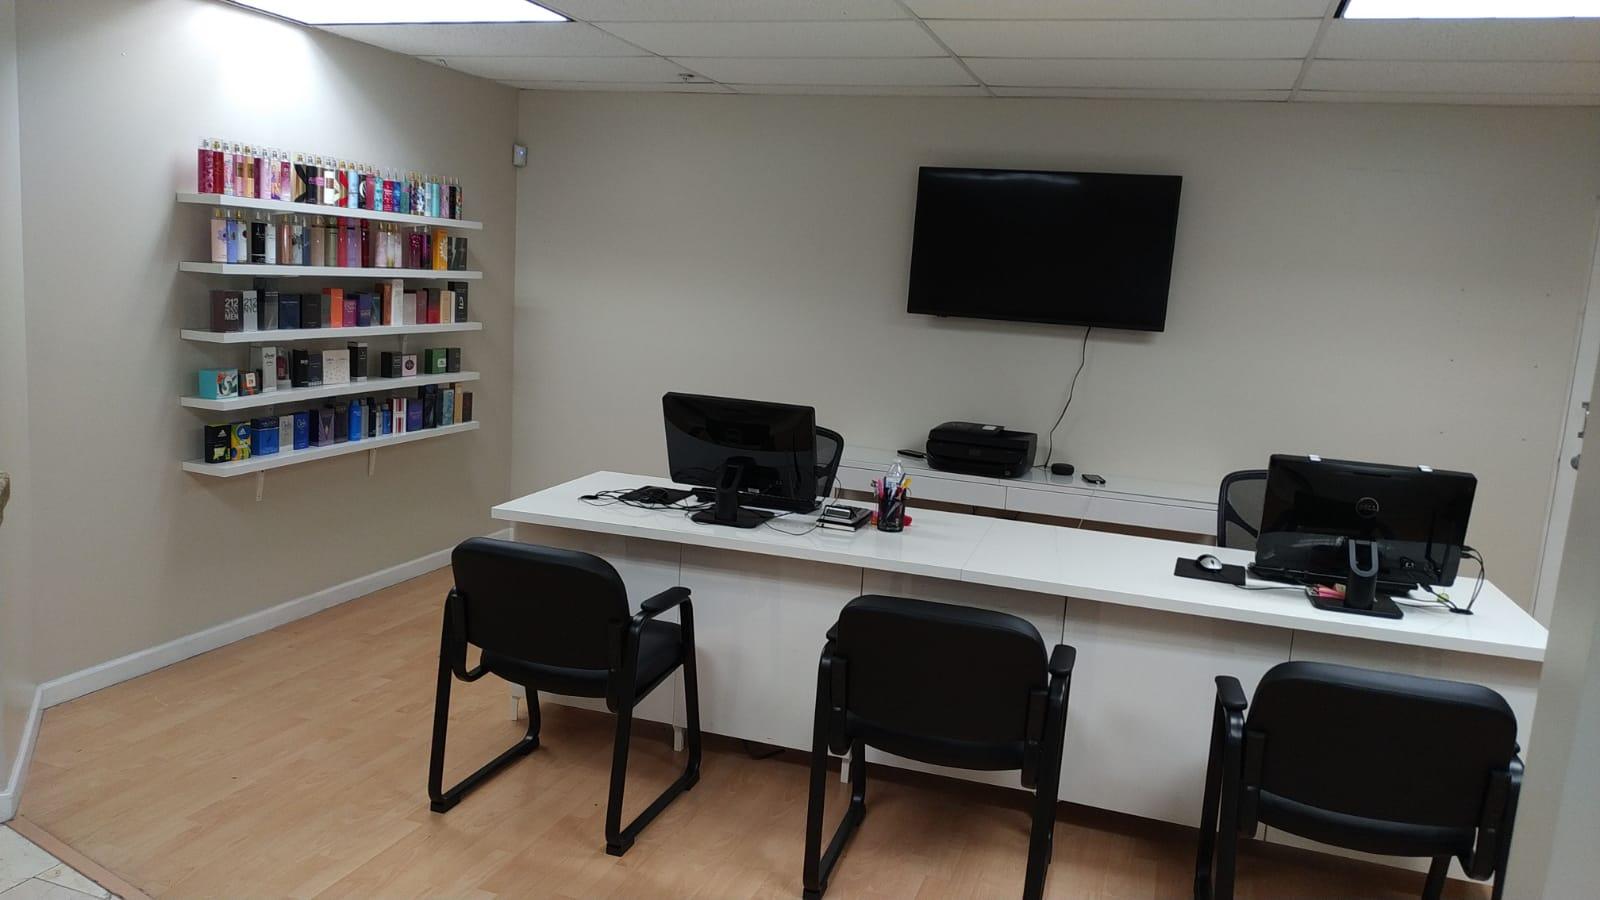 up-office-image-1.jpg